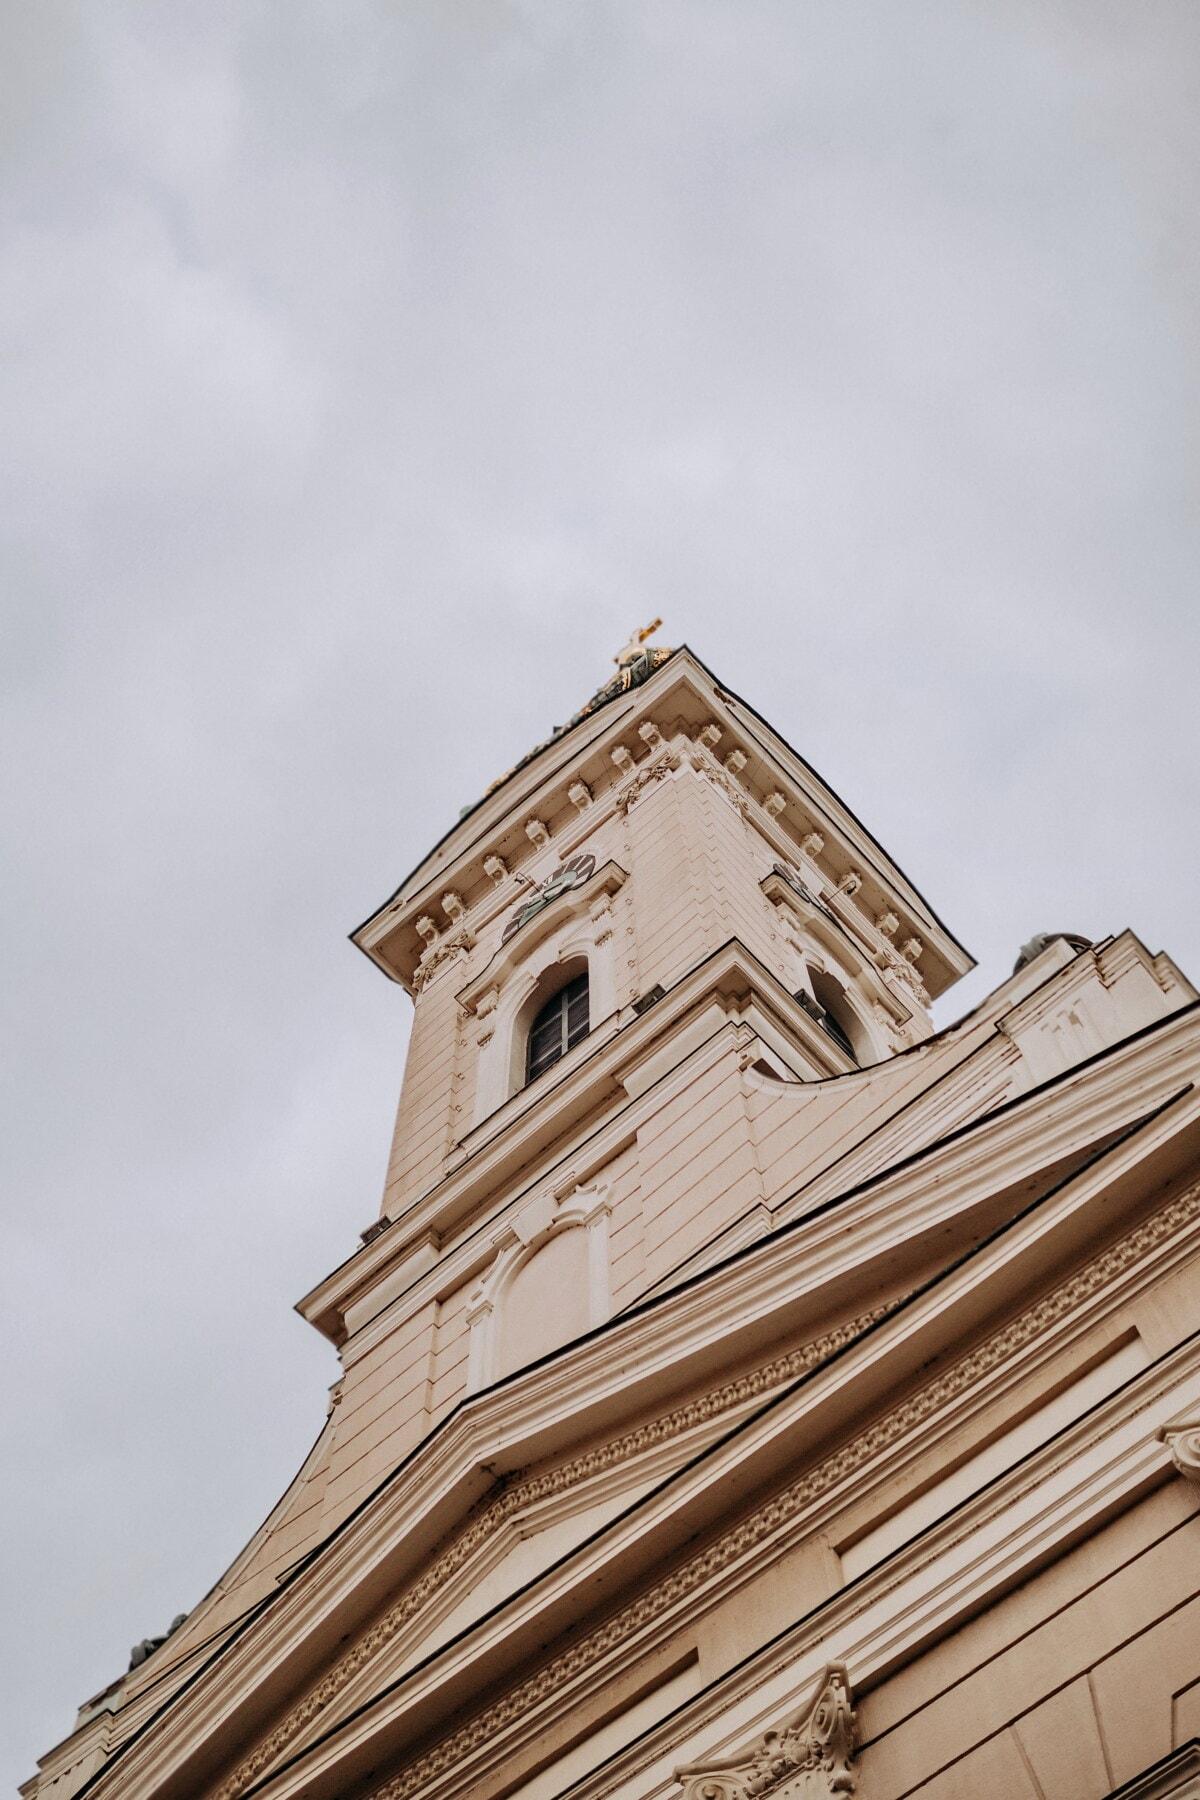 vinkel, kirketårnet, fasade, katedralen, tårnet, arkitektur, klokke, bygge, kirke, gamle